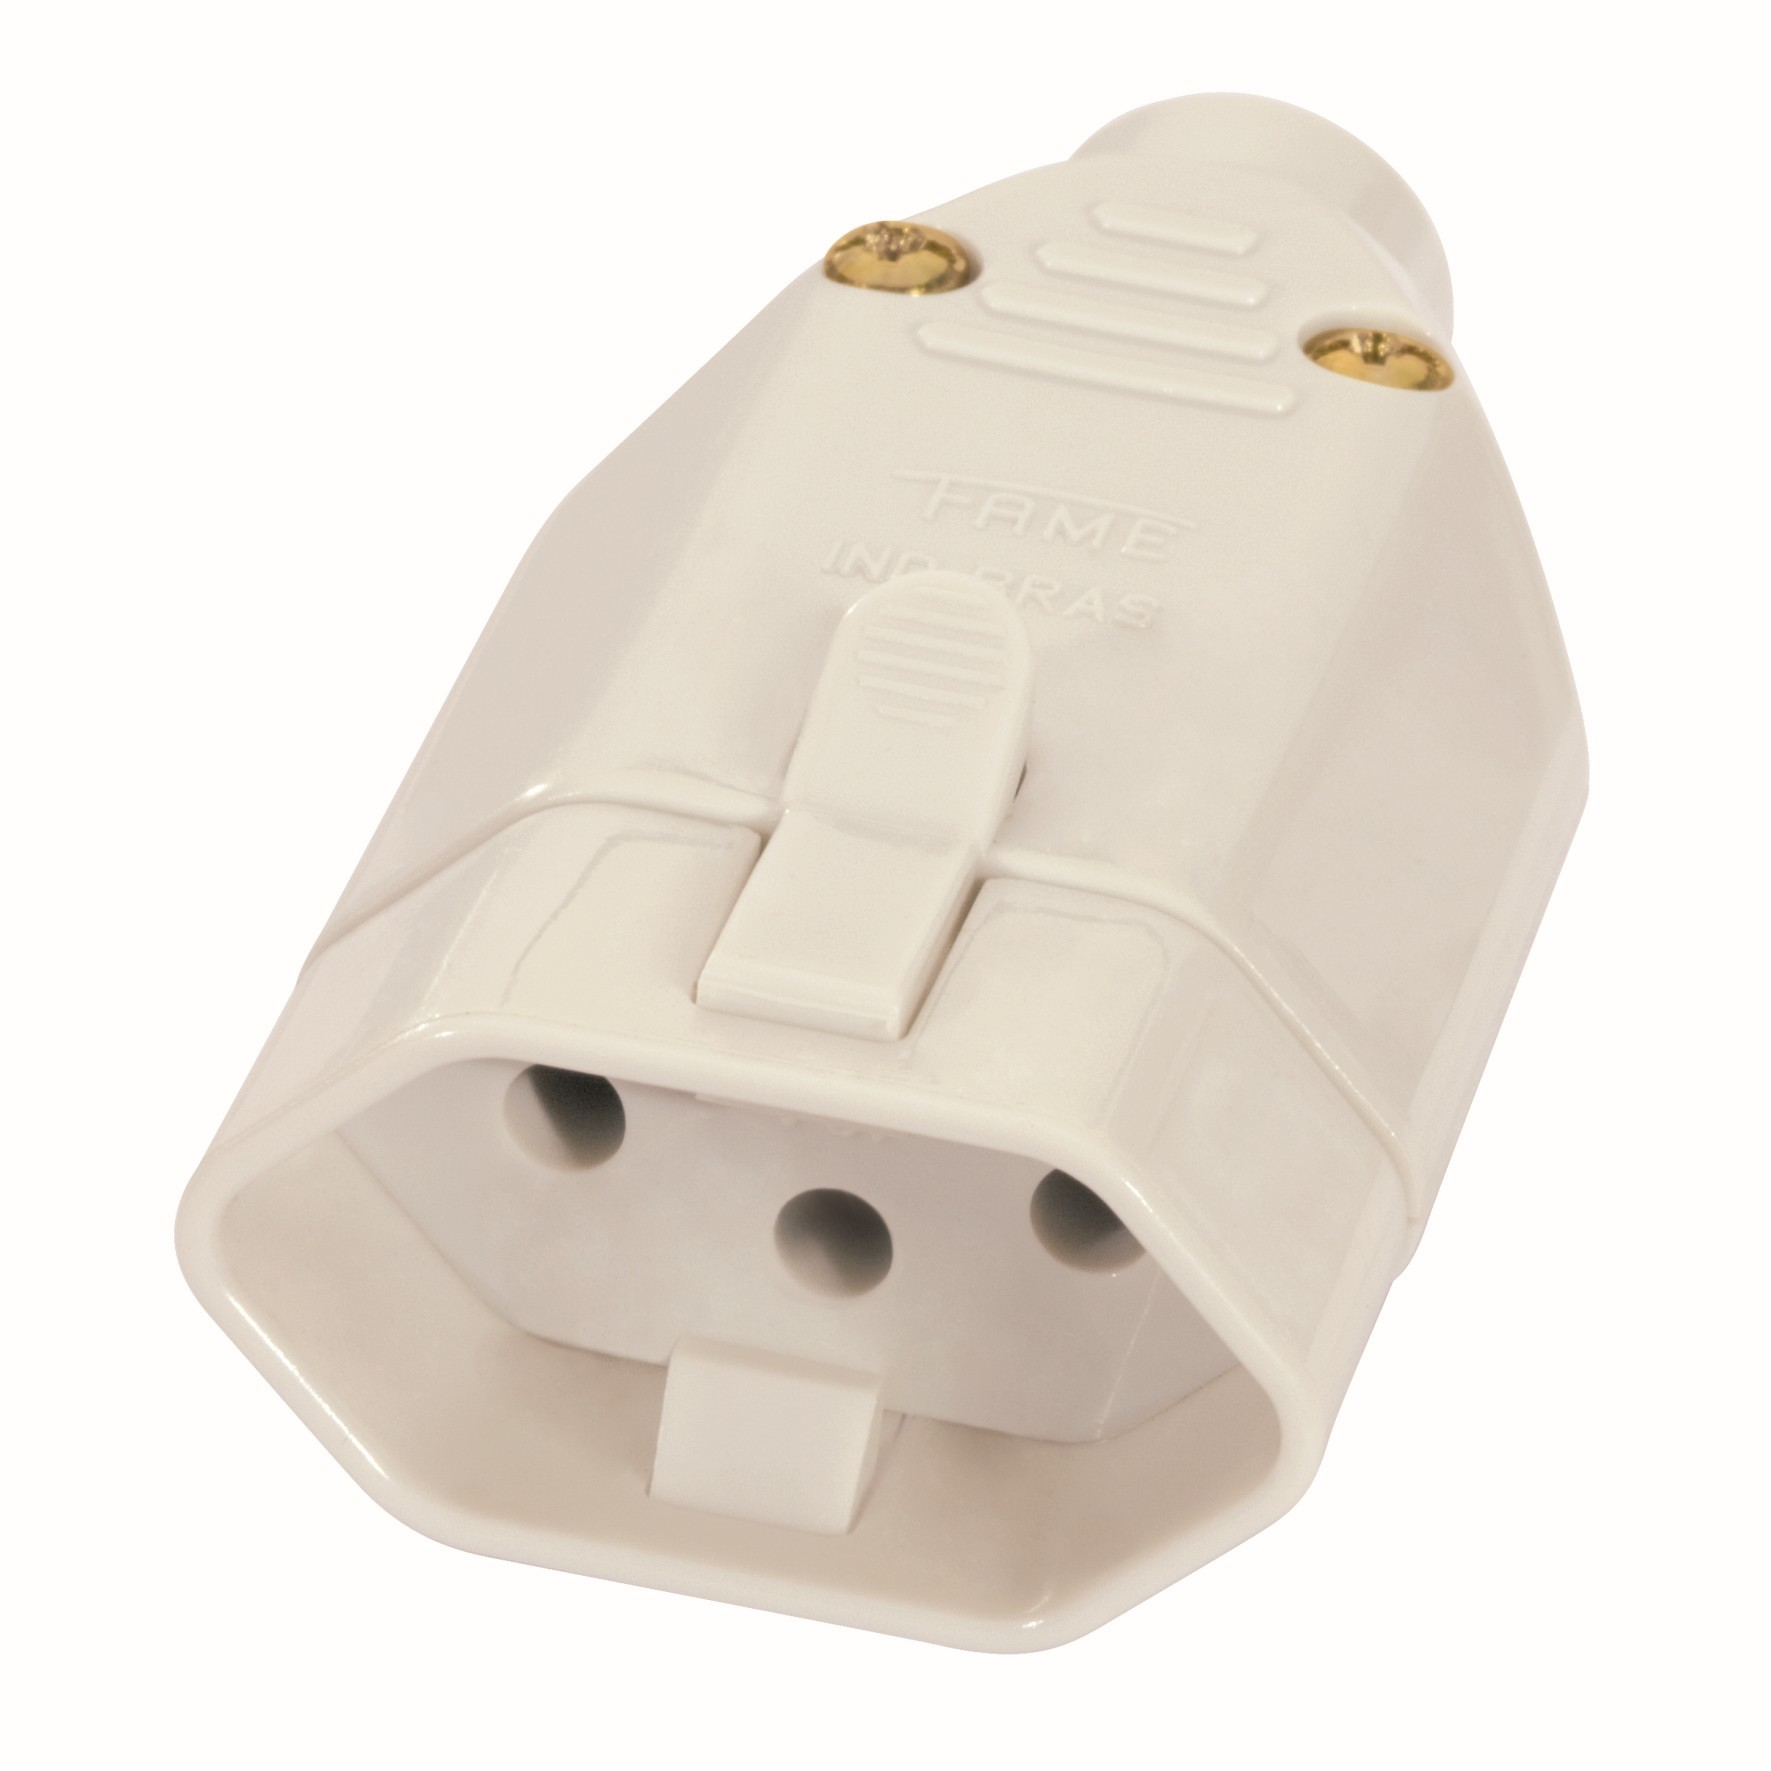 Plug Femea 2PT 10A Cinza - Fame Eletrica